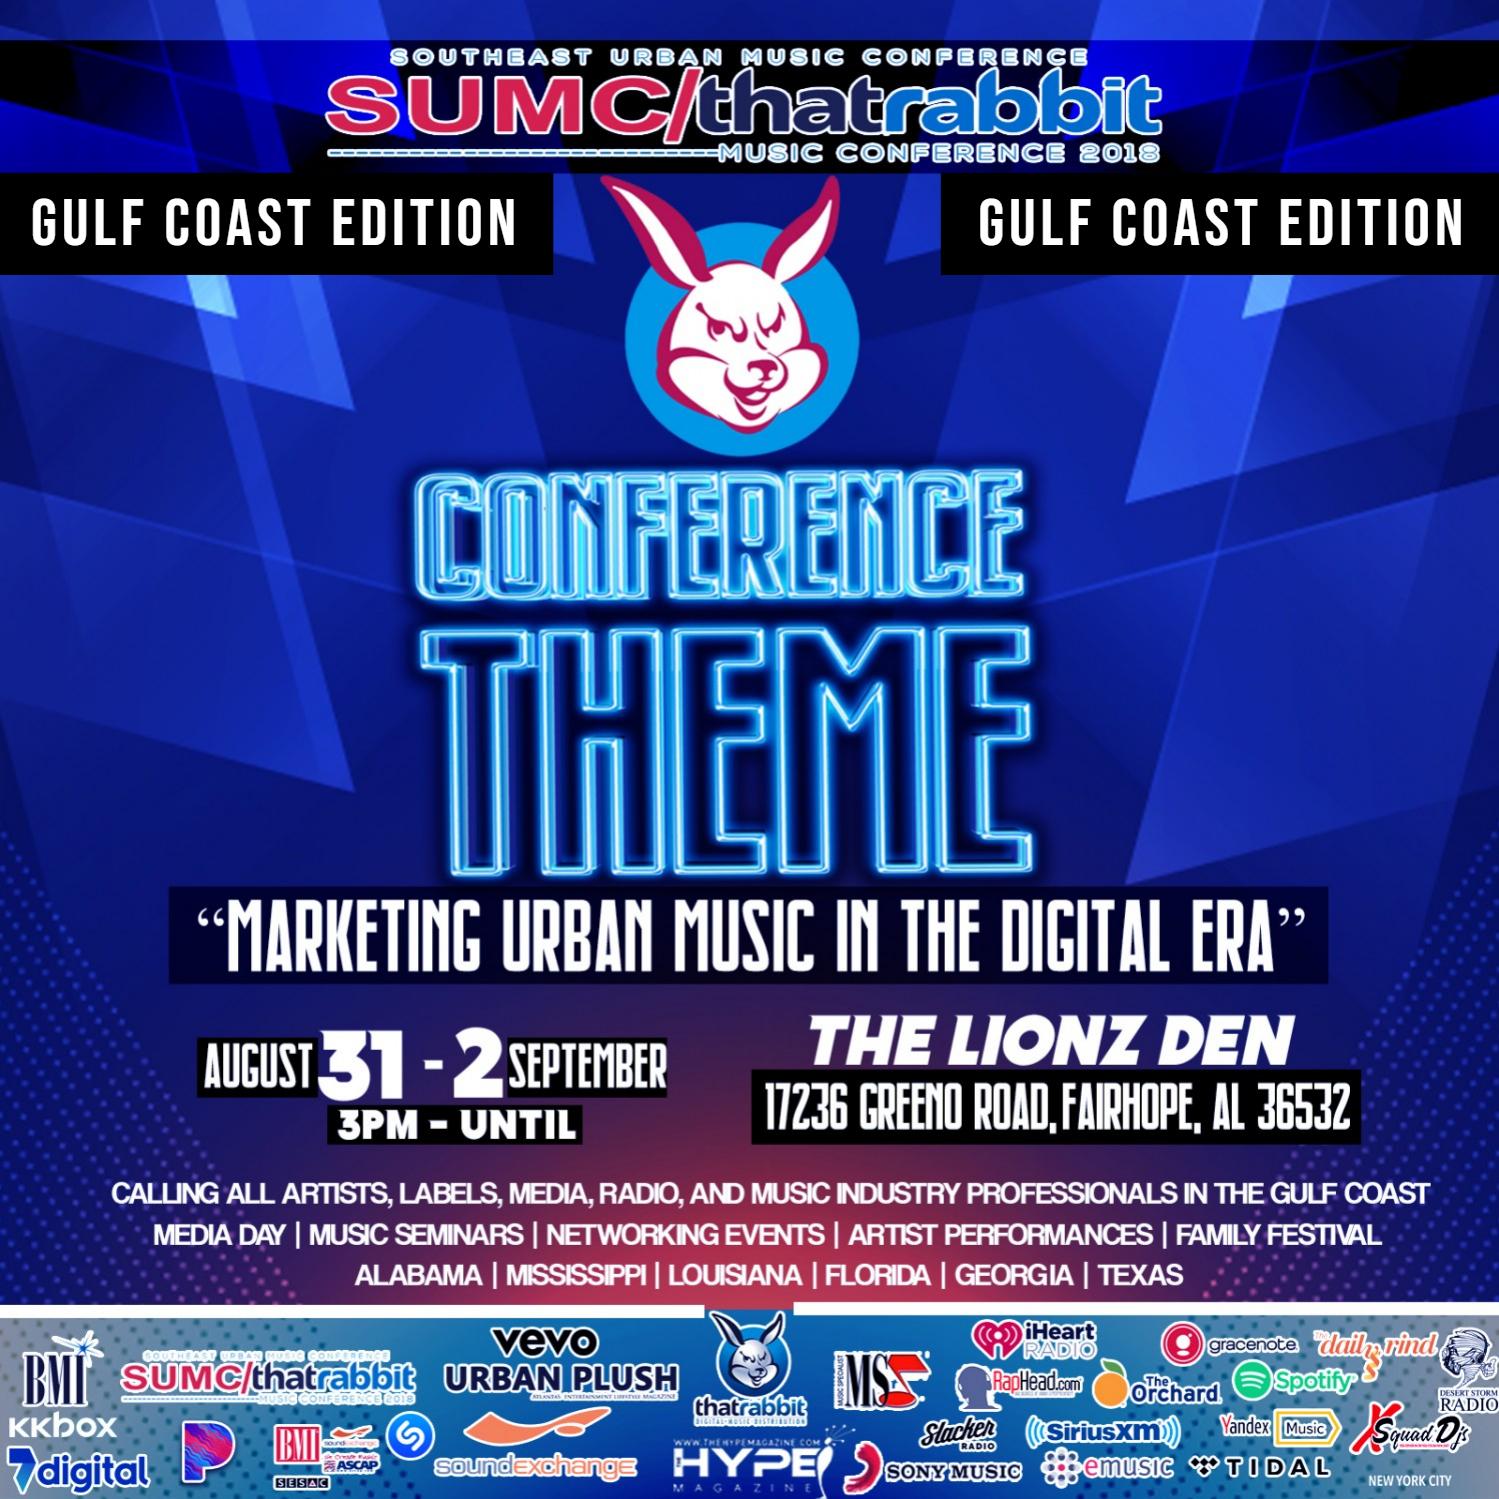 SUMC THAT RABBIT URBAN MUSIC CONFERENCE AUG 31st SEPT 2nd Fairhope AL